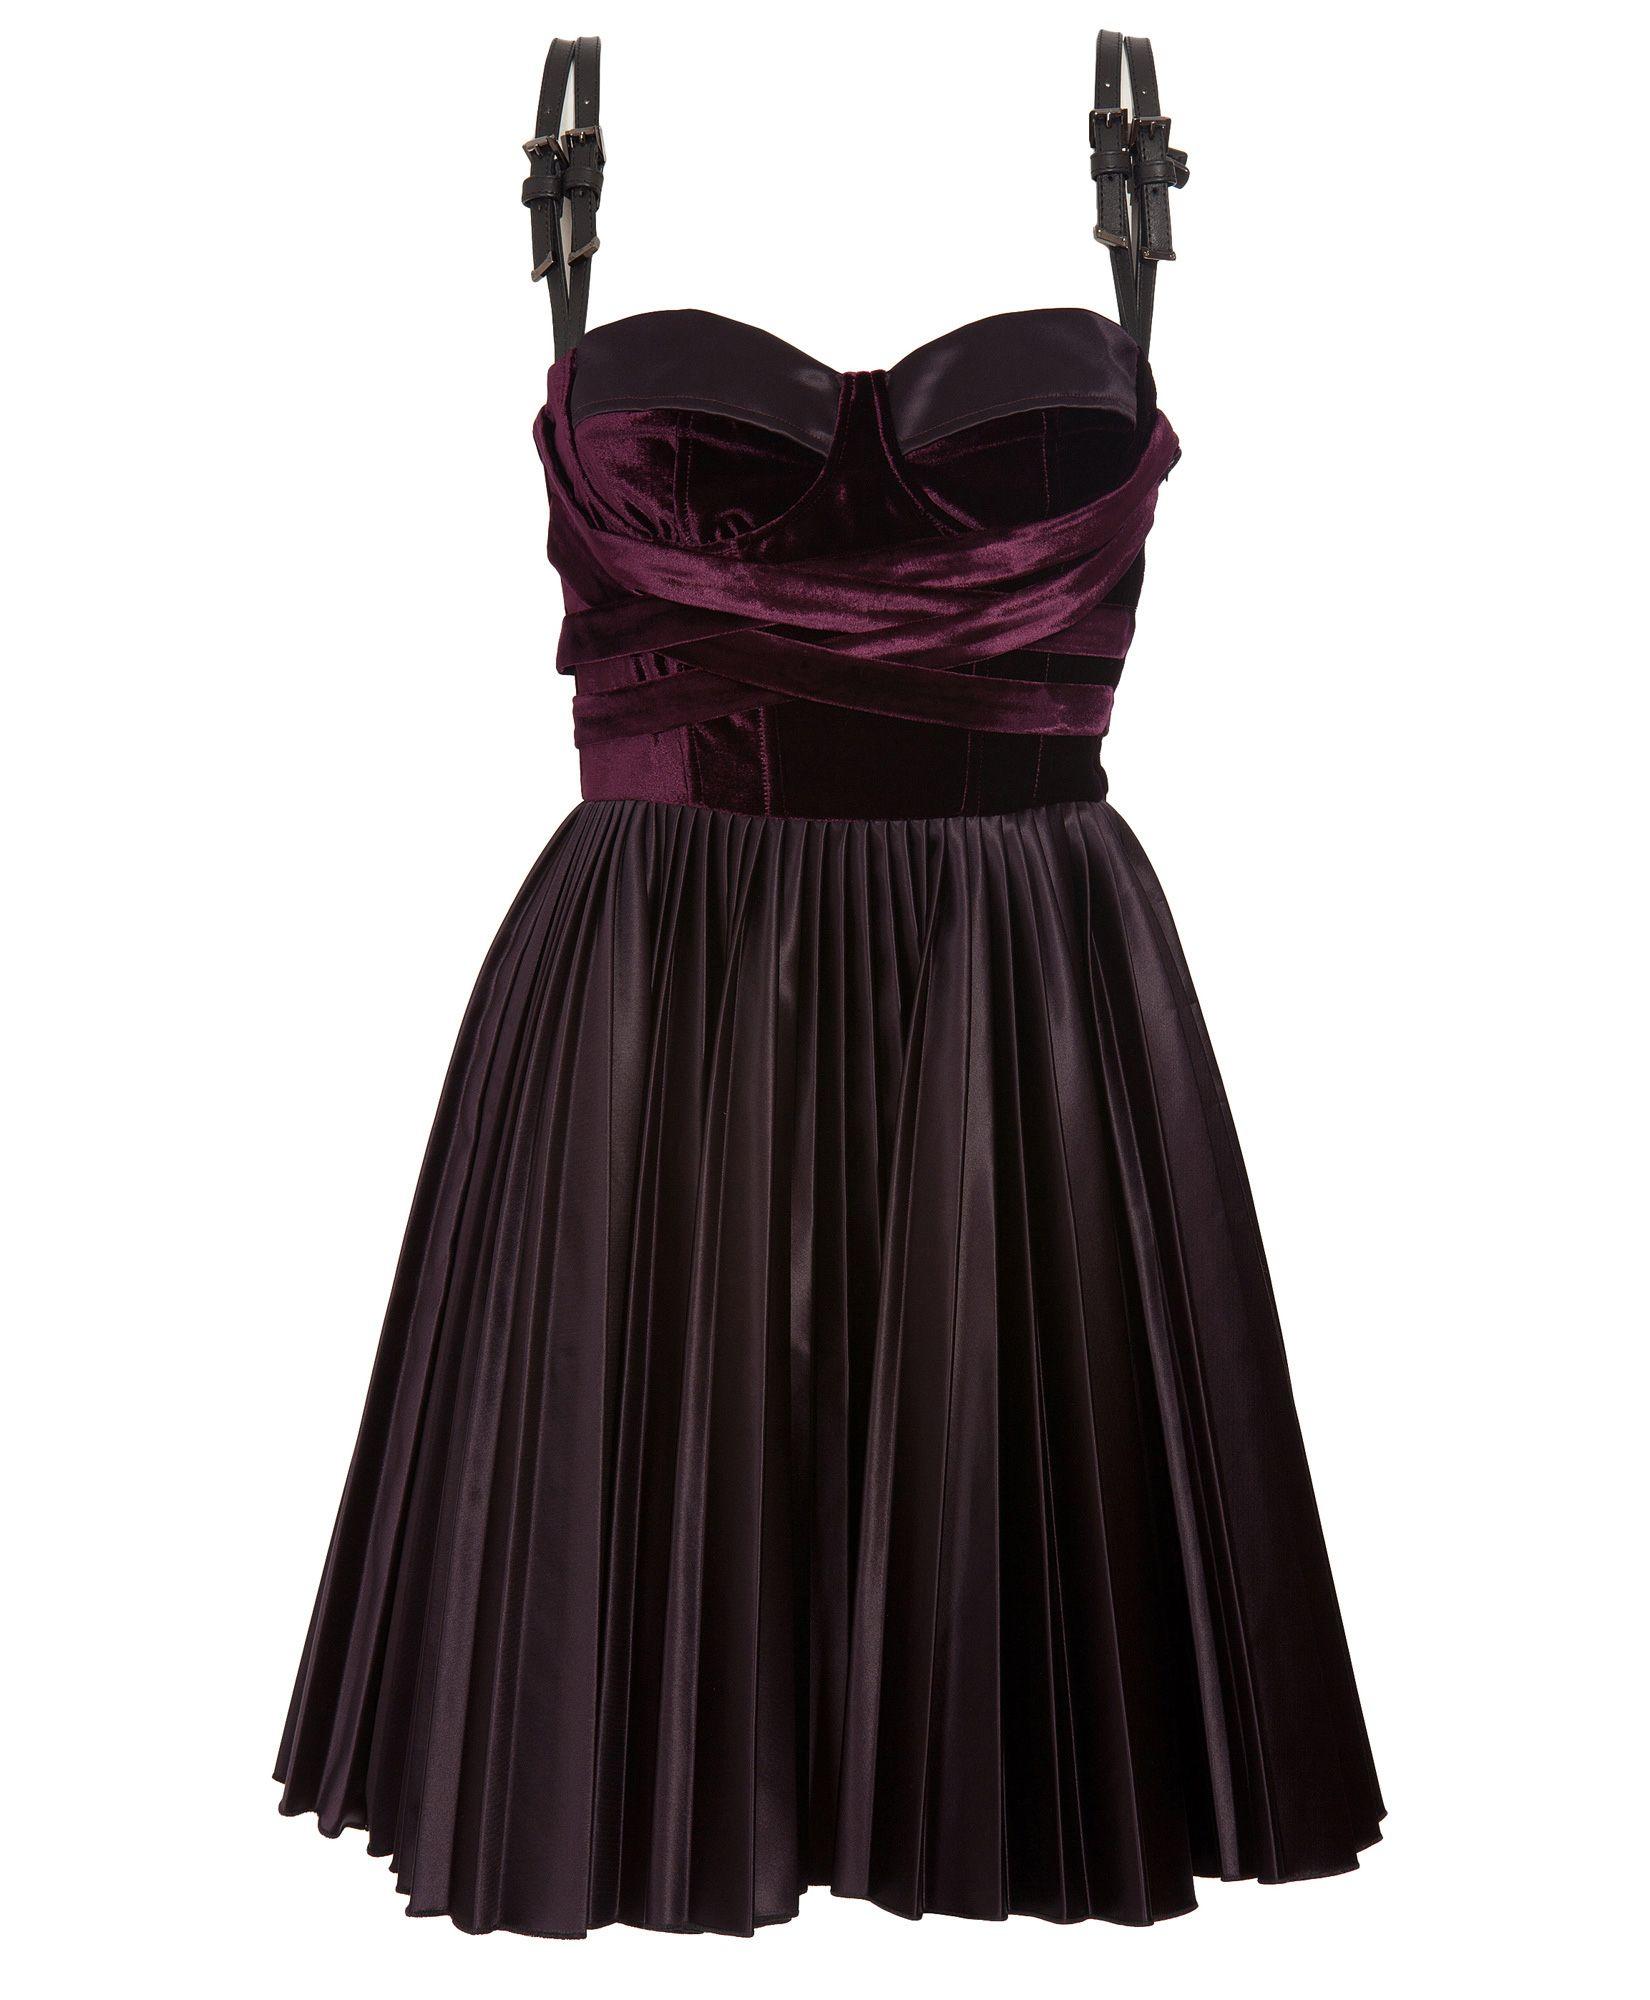 Best of the velvet dress pack by versus dream wardrobes leather